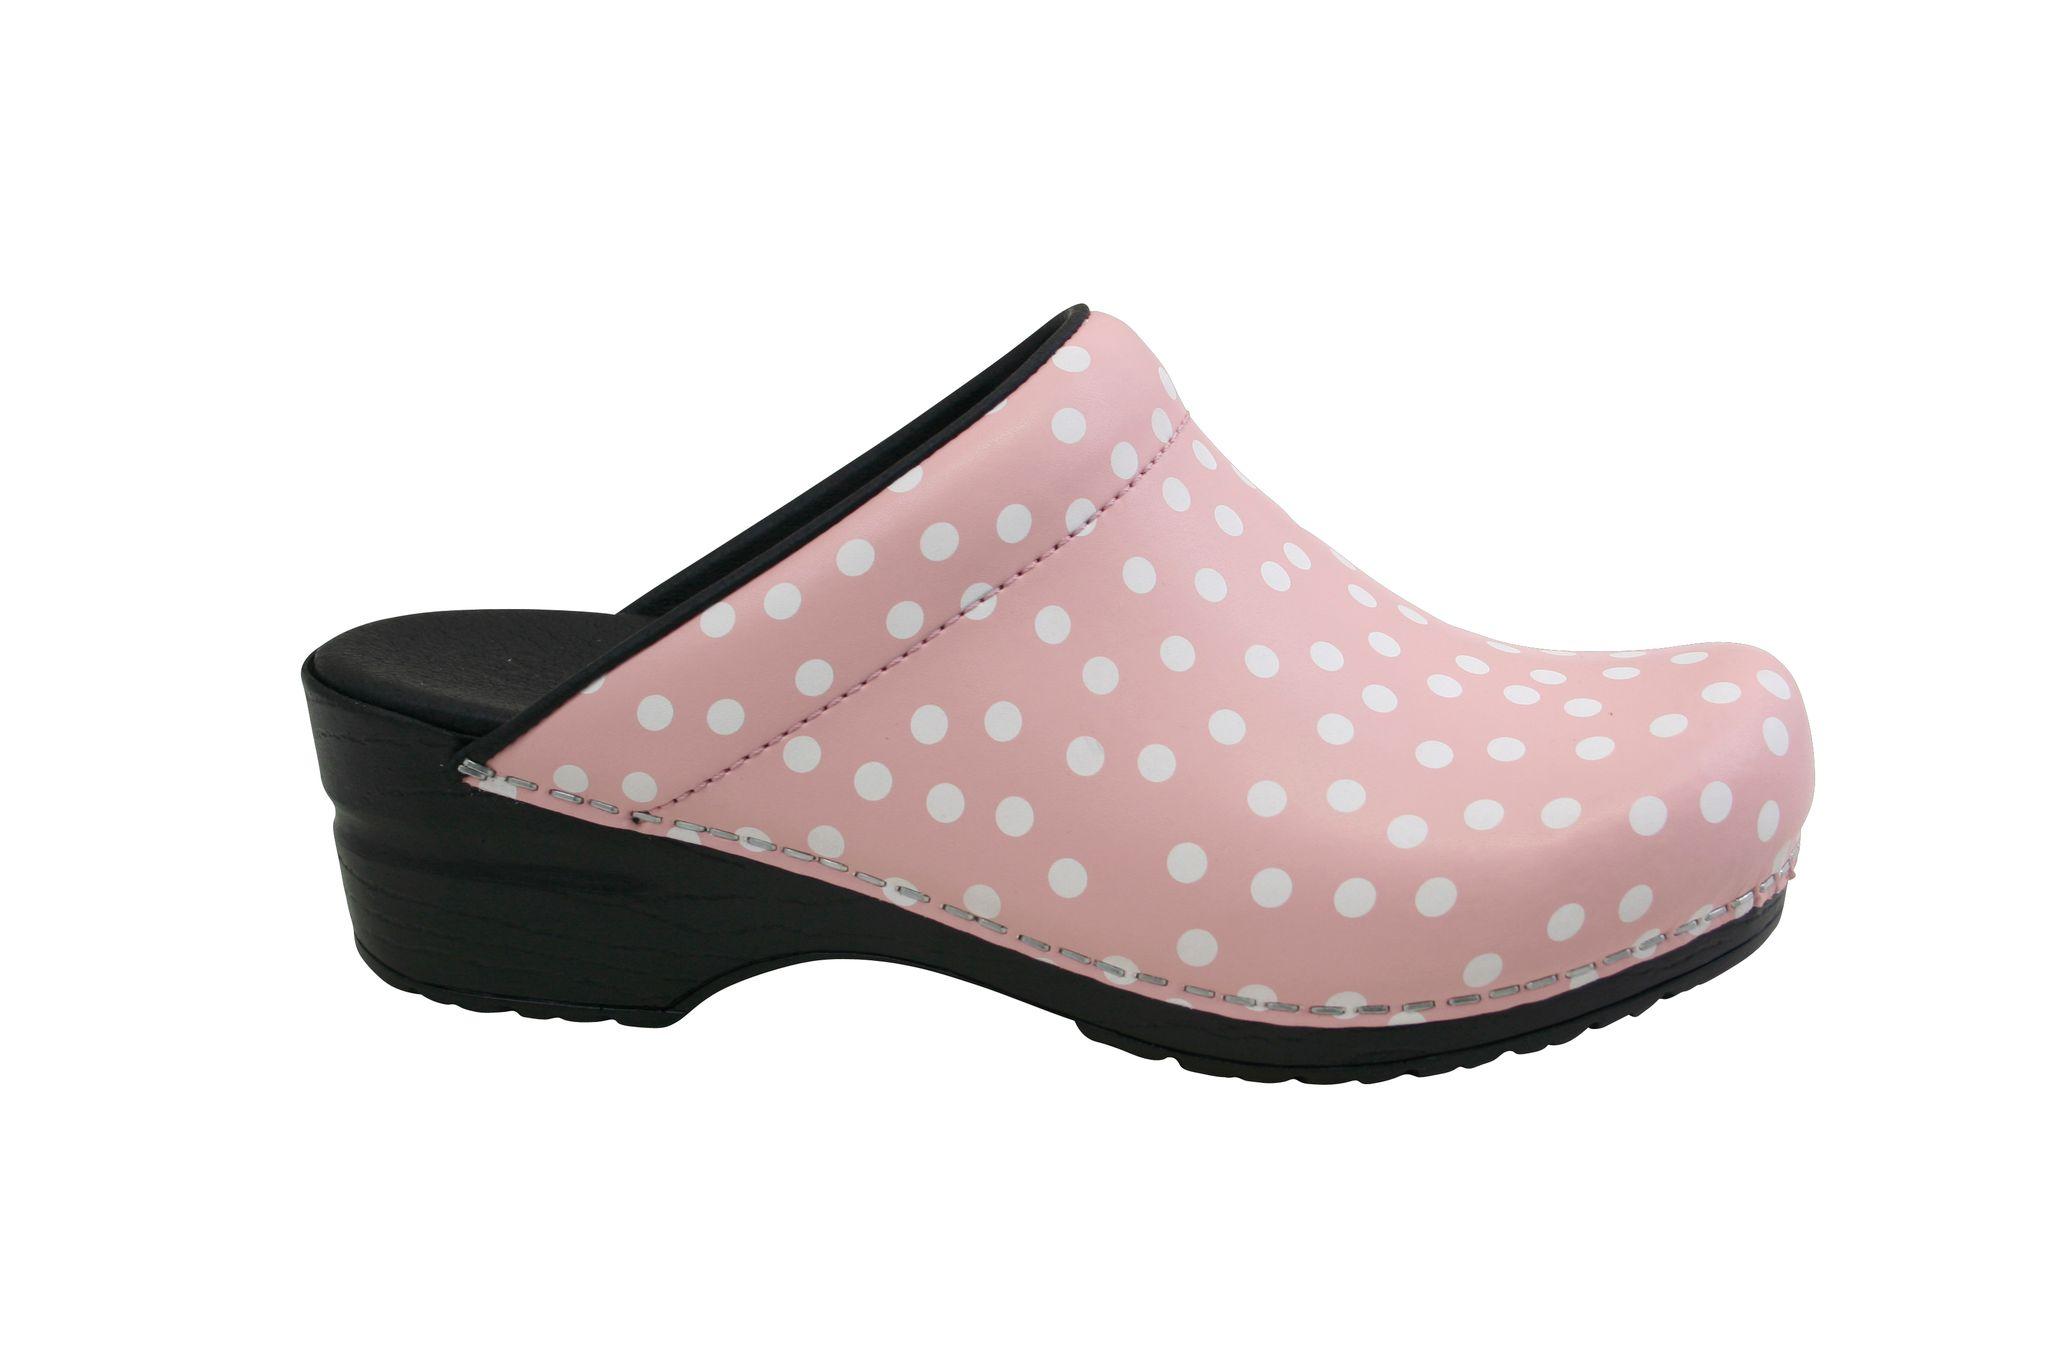 Sanita klompen Fenja roze 457048 online bestellen